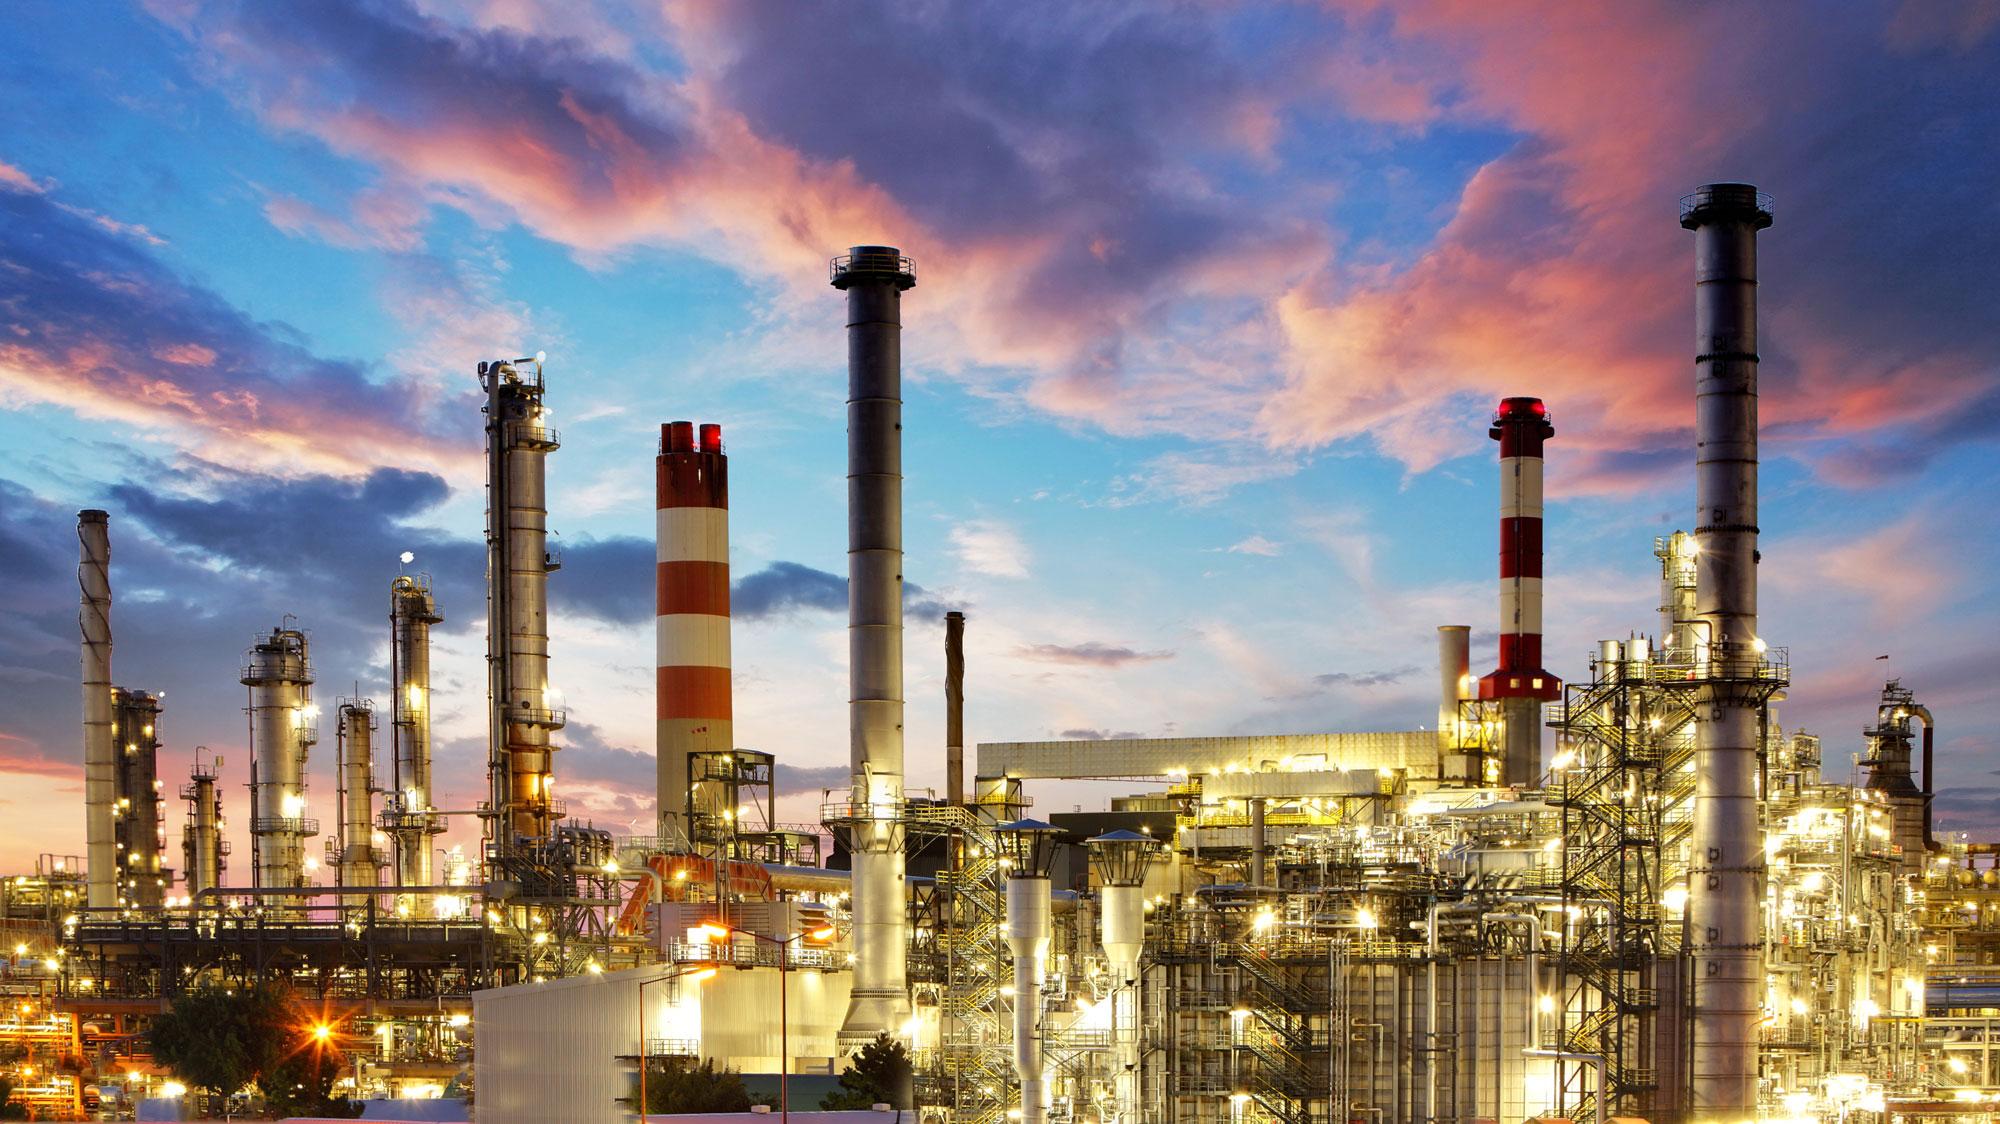 invia-bina-teknolojileri-fabrika